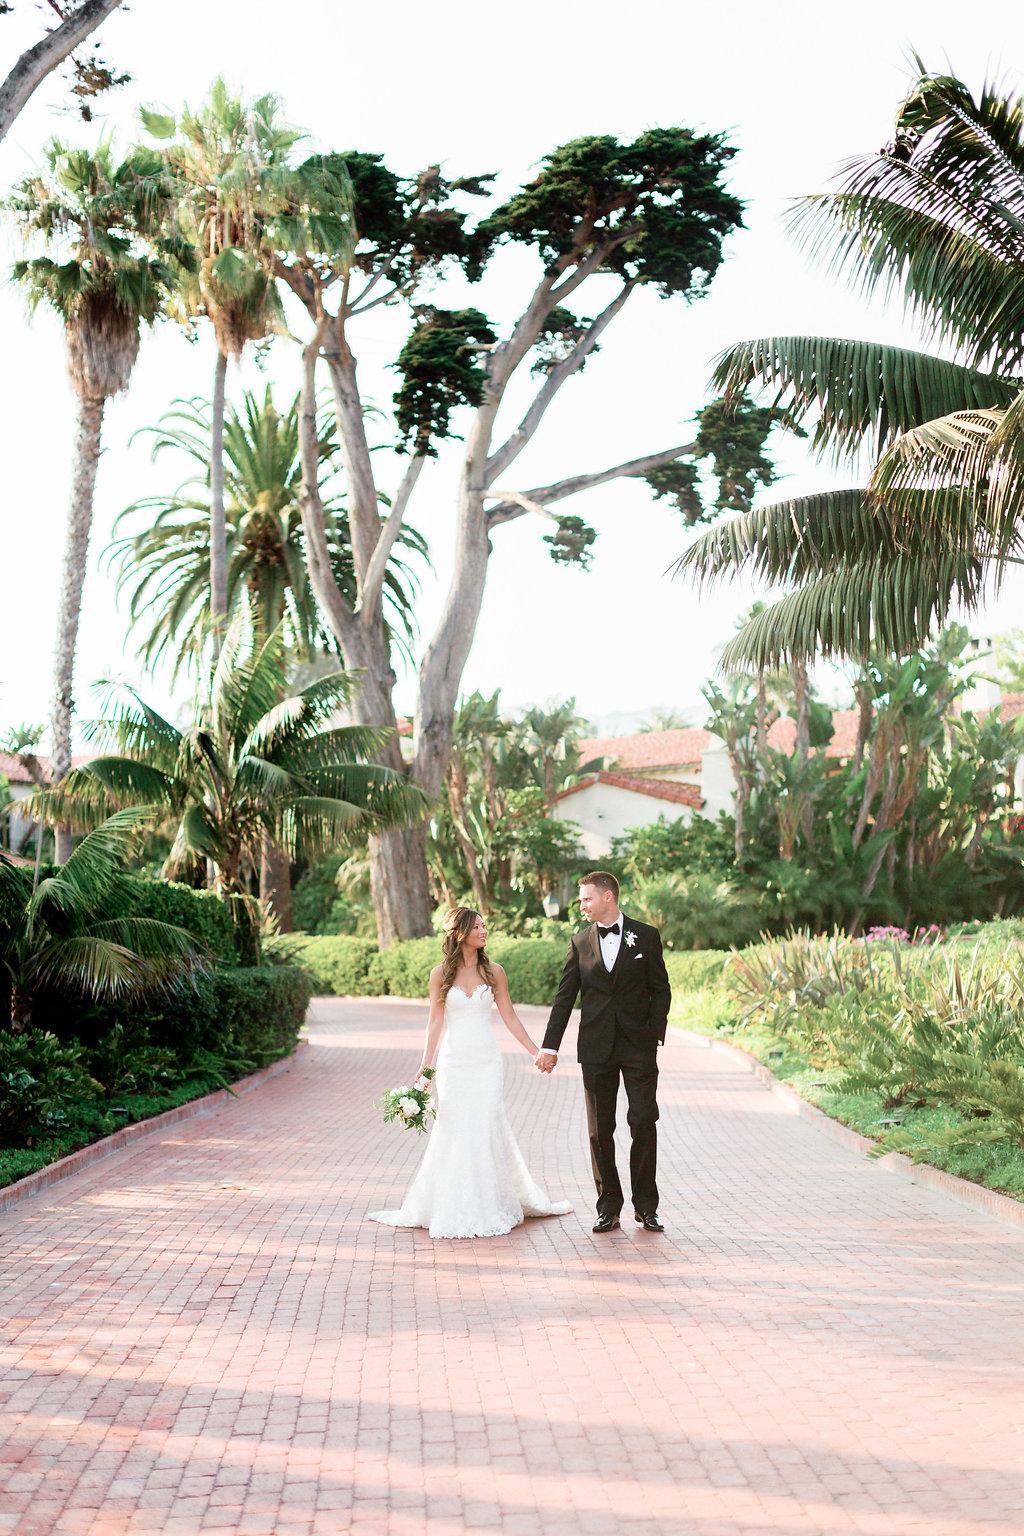 santa-barbara-elopement-elope-wedding-planner-coordinator-day-of-four-seasons-biltmore-ocean-front-view-garden-pink-white-green-montecito-black-tie (7).jpg